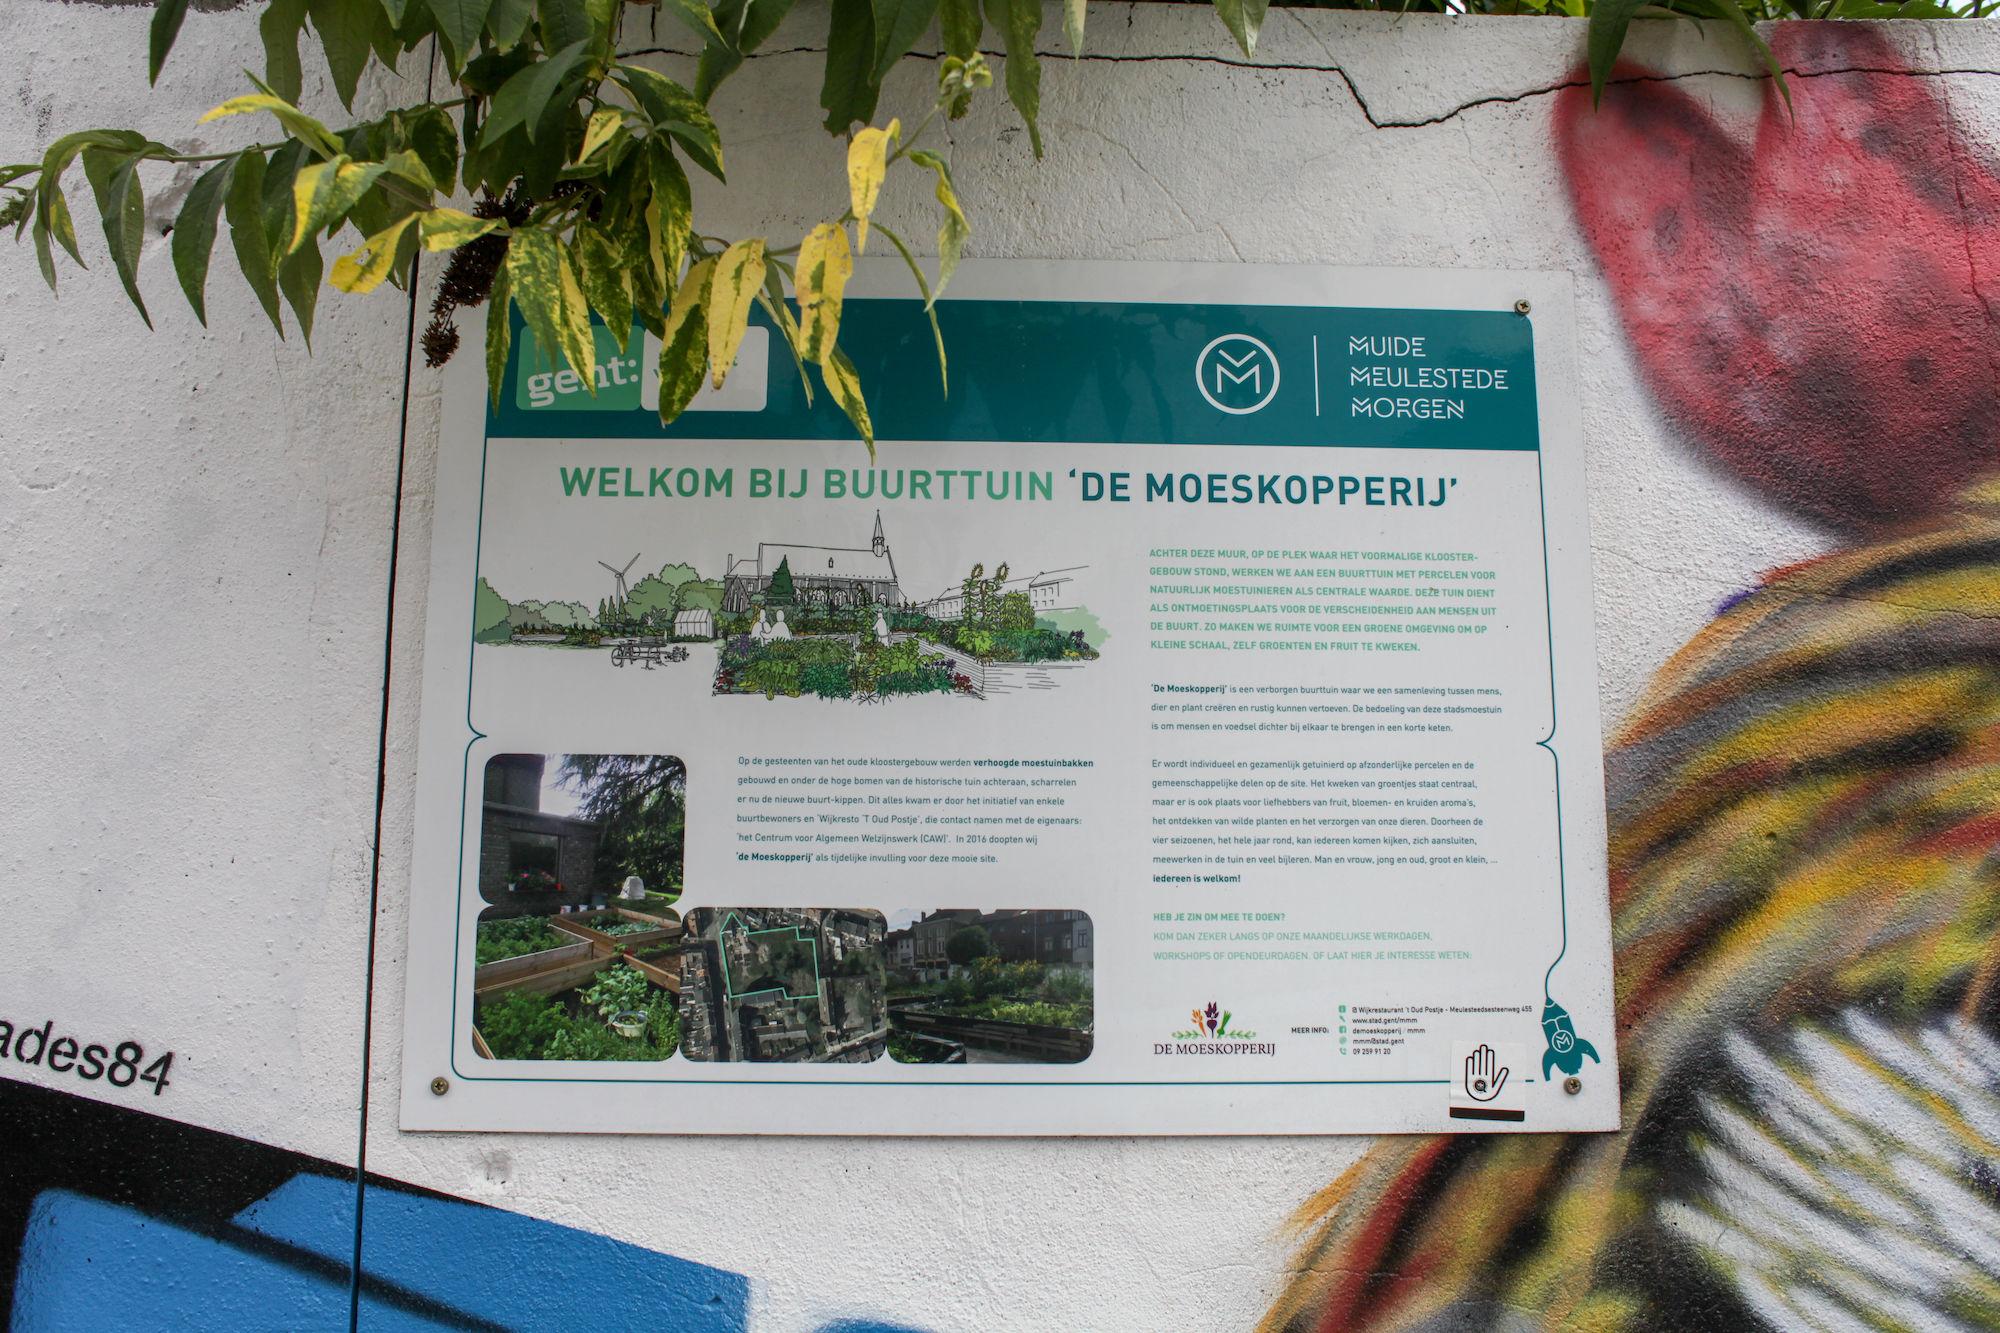 2019-07-02 Muide Meulestede prospectie Wannes_stadsvernieuwing_IMG_0308-2.jpg